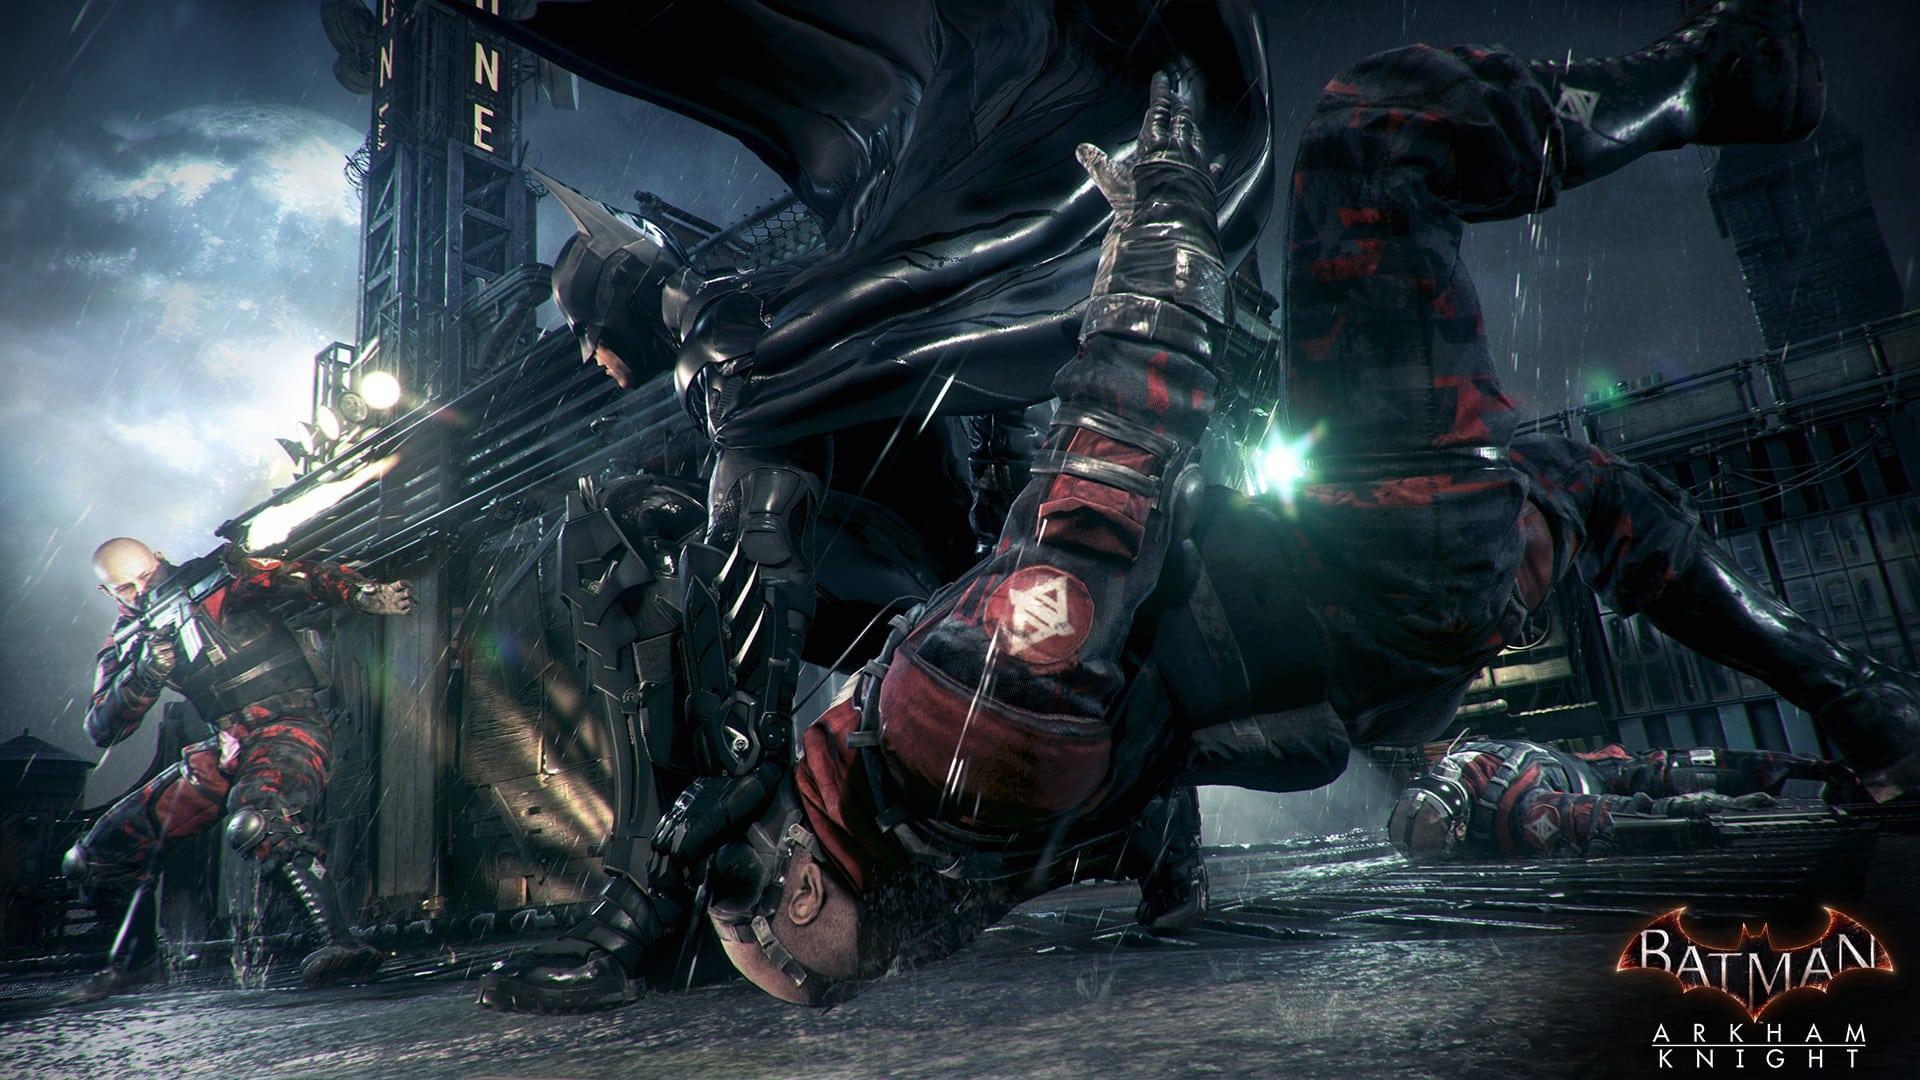 Wallpaper Batman With Batmobile Arkham Knight Vs In Action Bad Guys 2